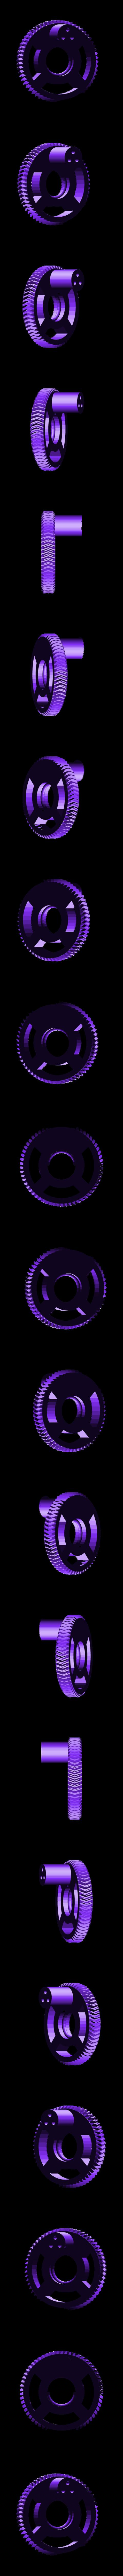 Drive_gear_A.stl Download free STL file Bubbles! • 3D printer object, Zippityboomba